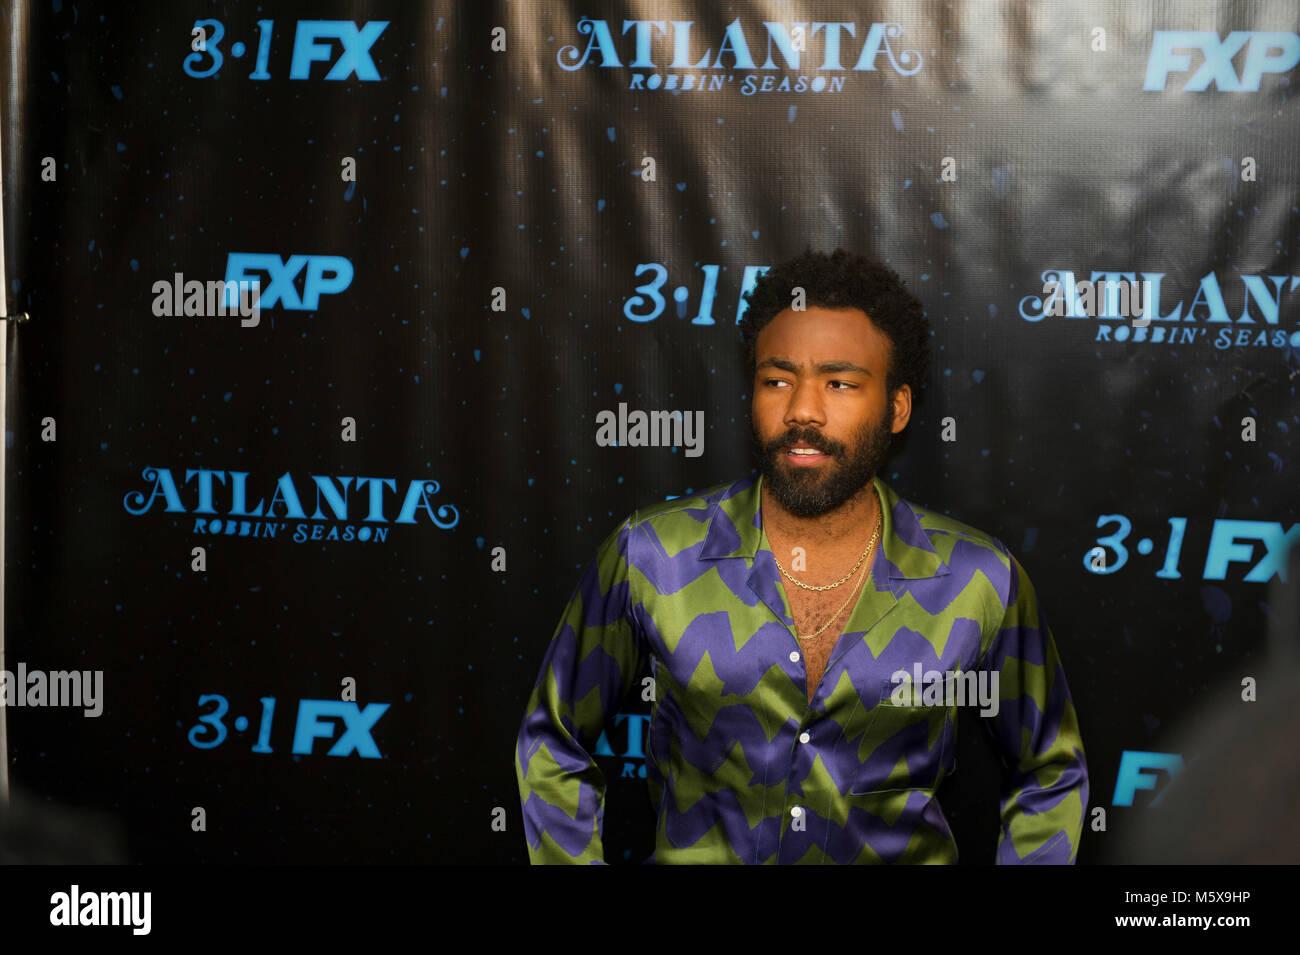 Atlanta, USA. 26th Feb, 2018. Actor/recording artist Donald Glover attends 'Atlanta Robbin' Season' - Stock Image